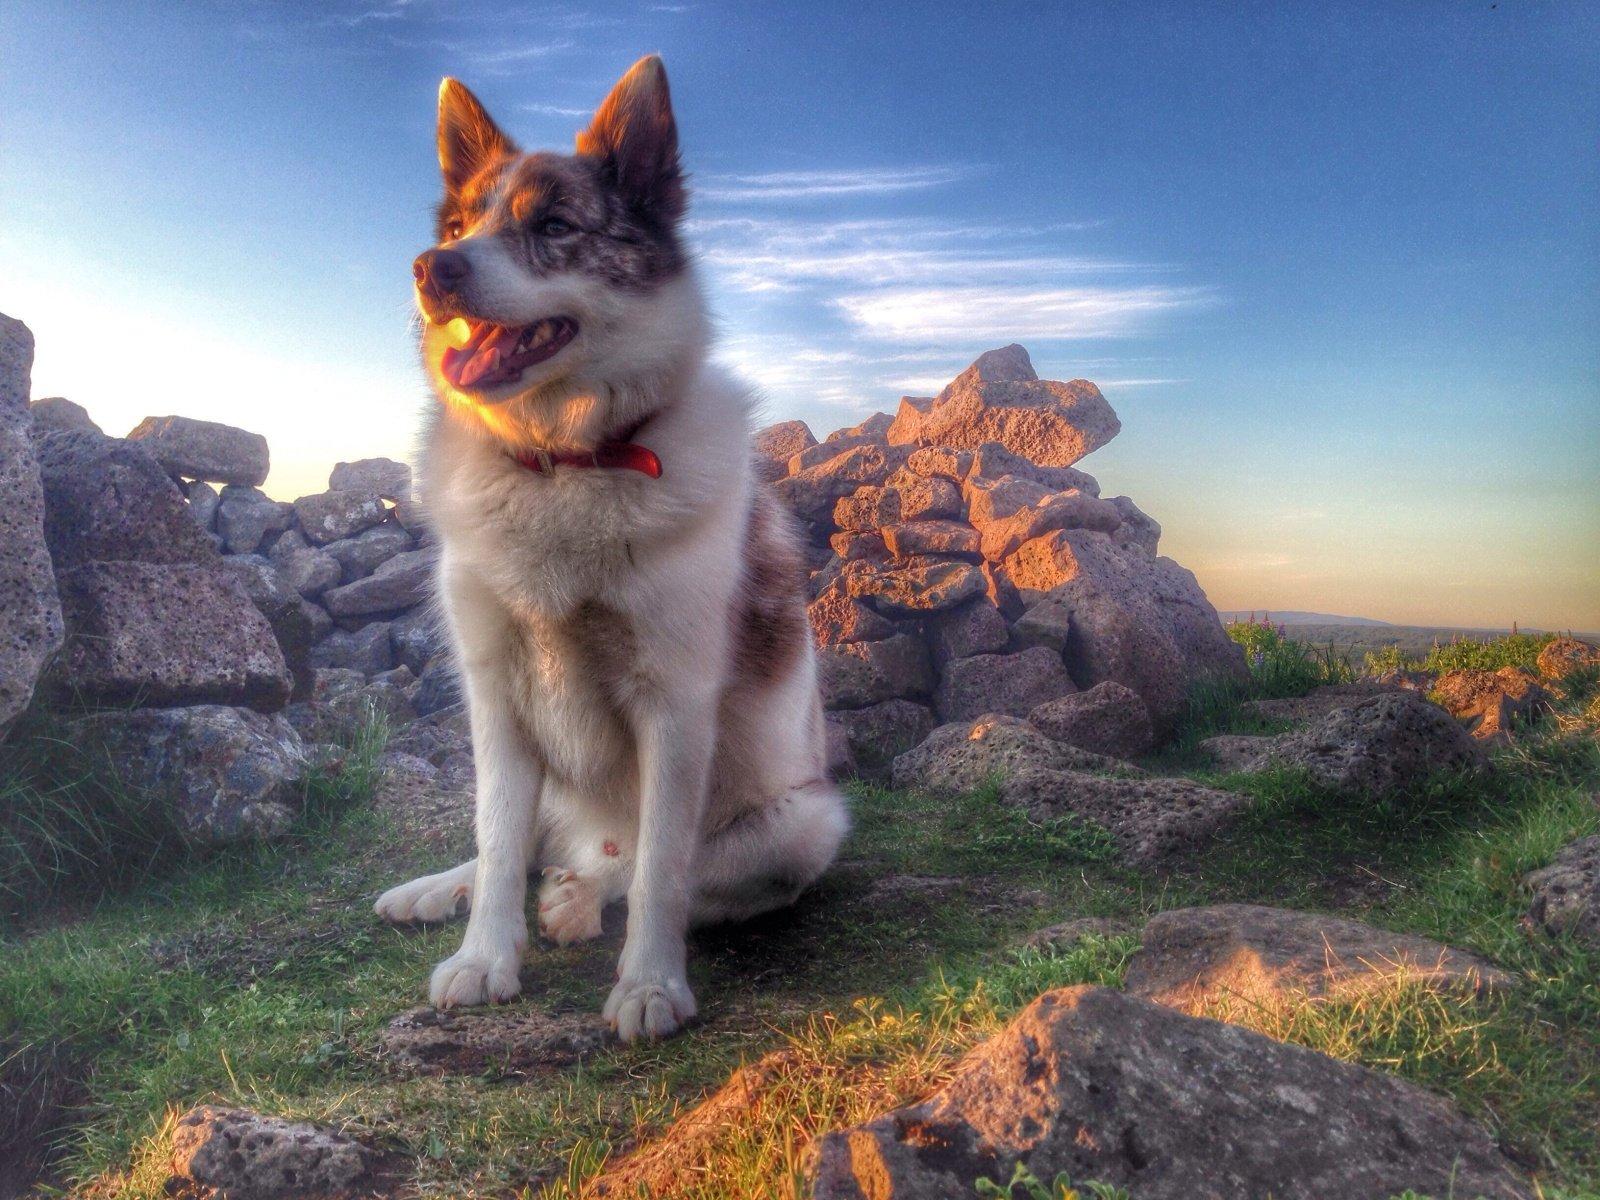 Icelandic Sheepdog breed